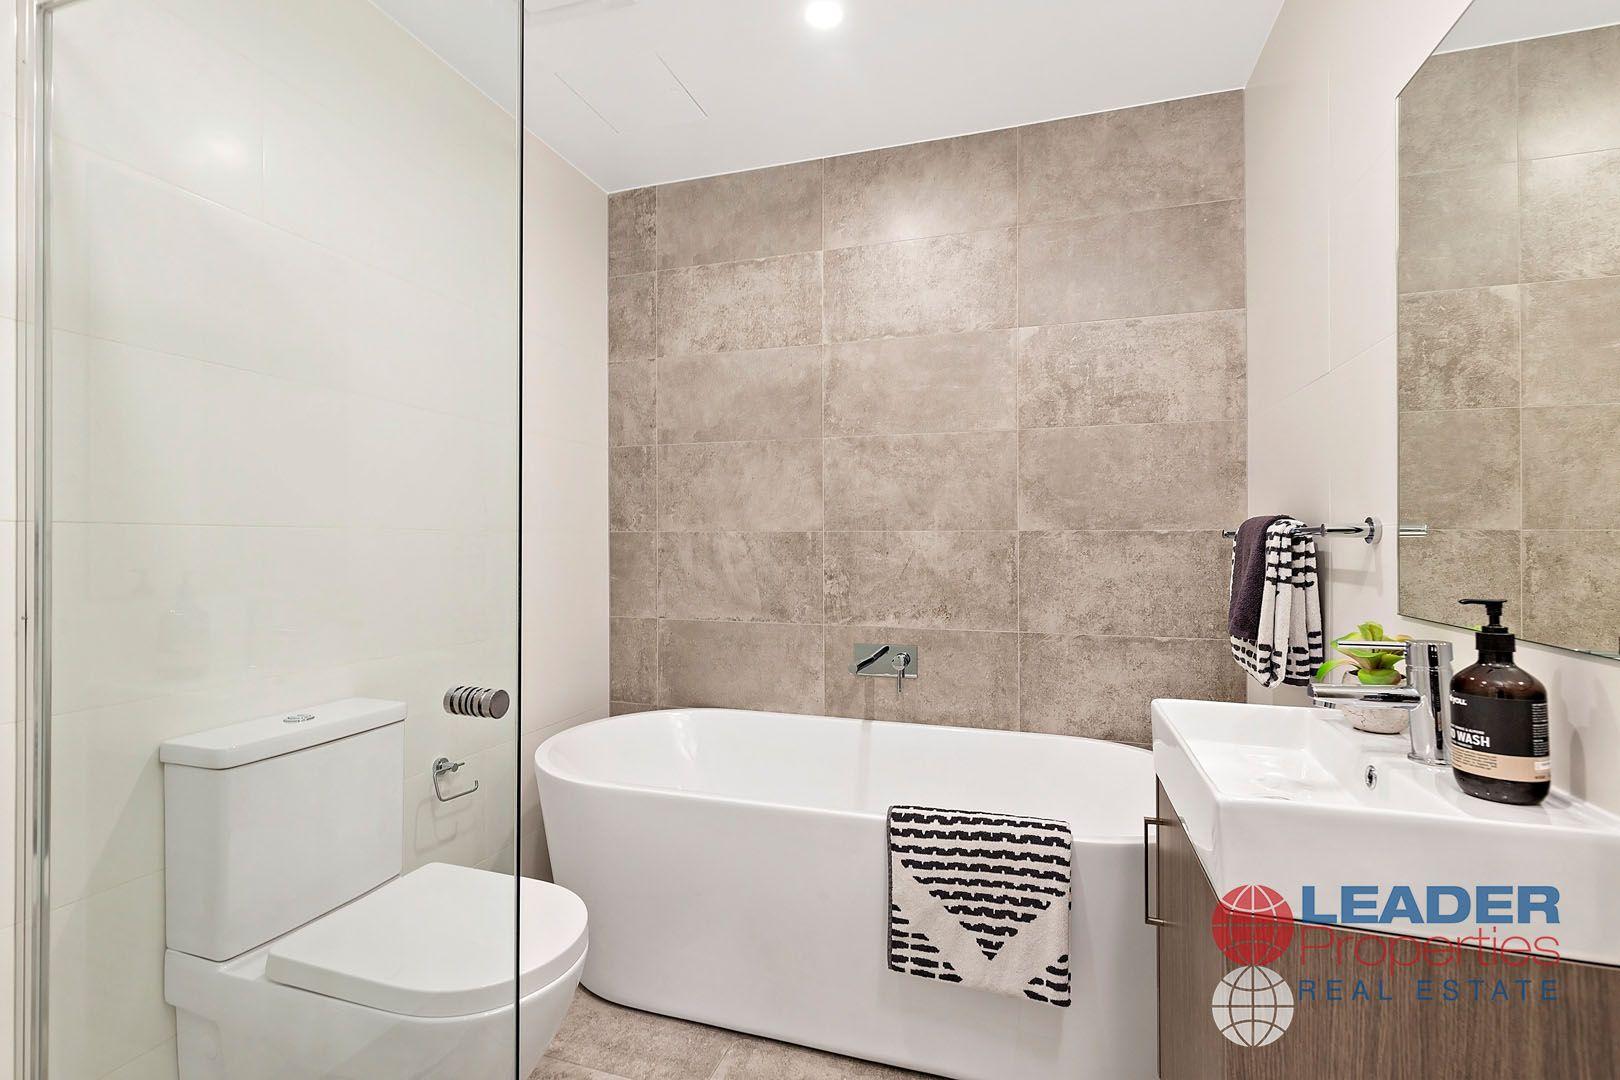 22-24 Grosvenor Street, Croydon NSW 2132, Image 1